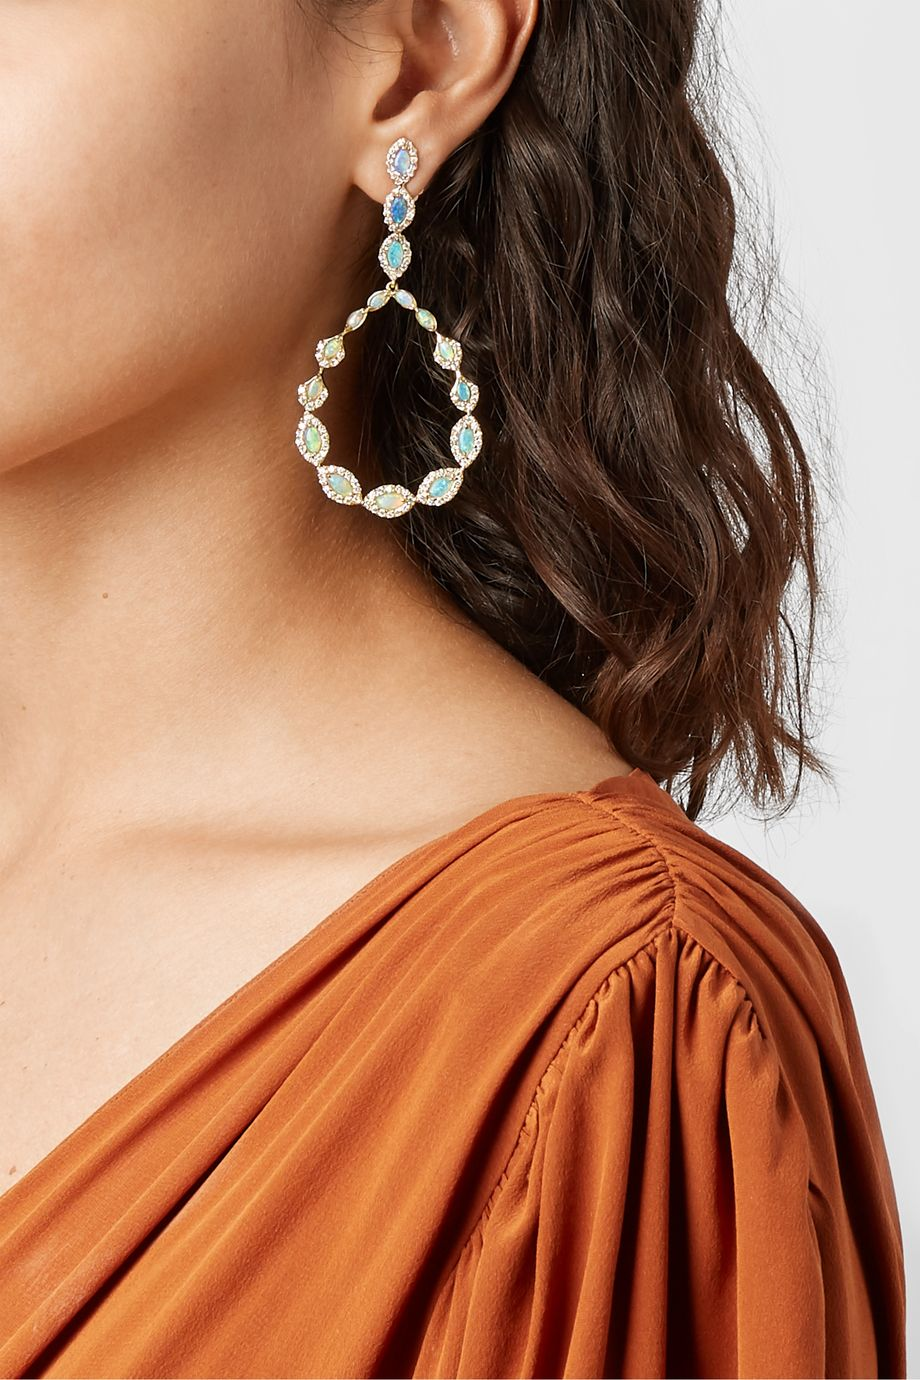 Kimberly McDonald 18-karat gold, opal and diamond earrings